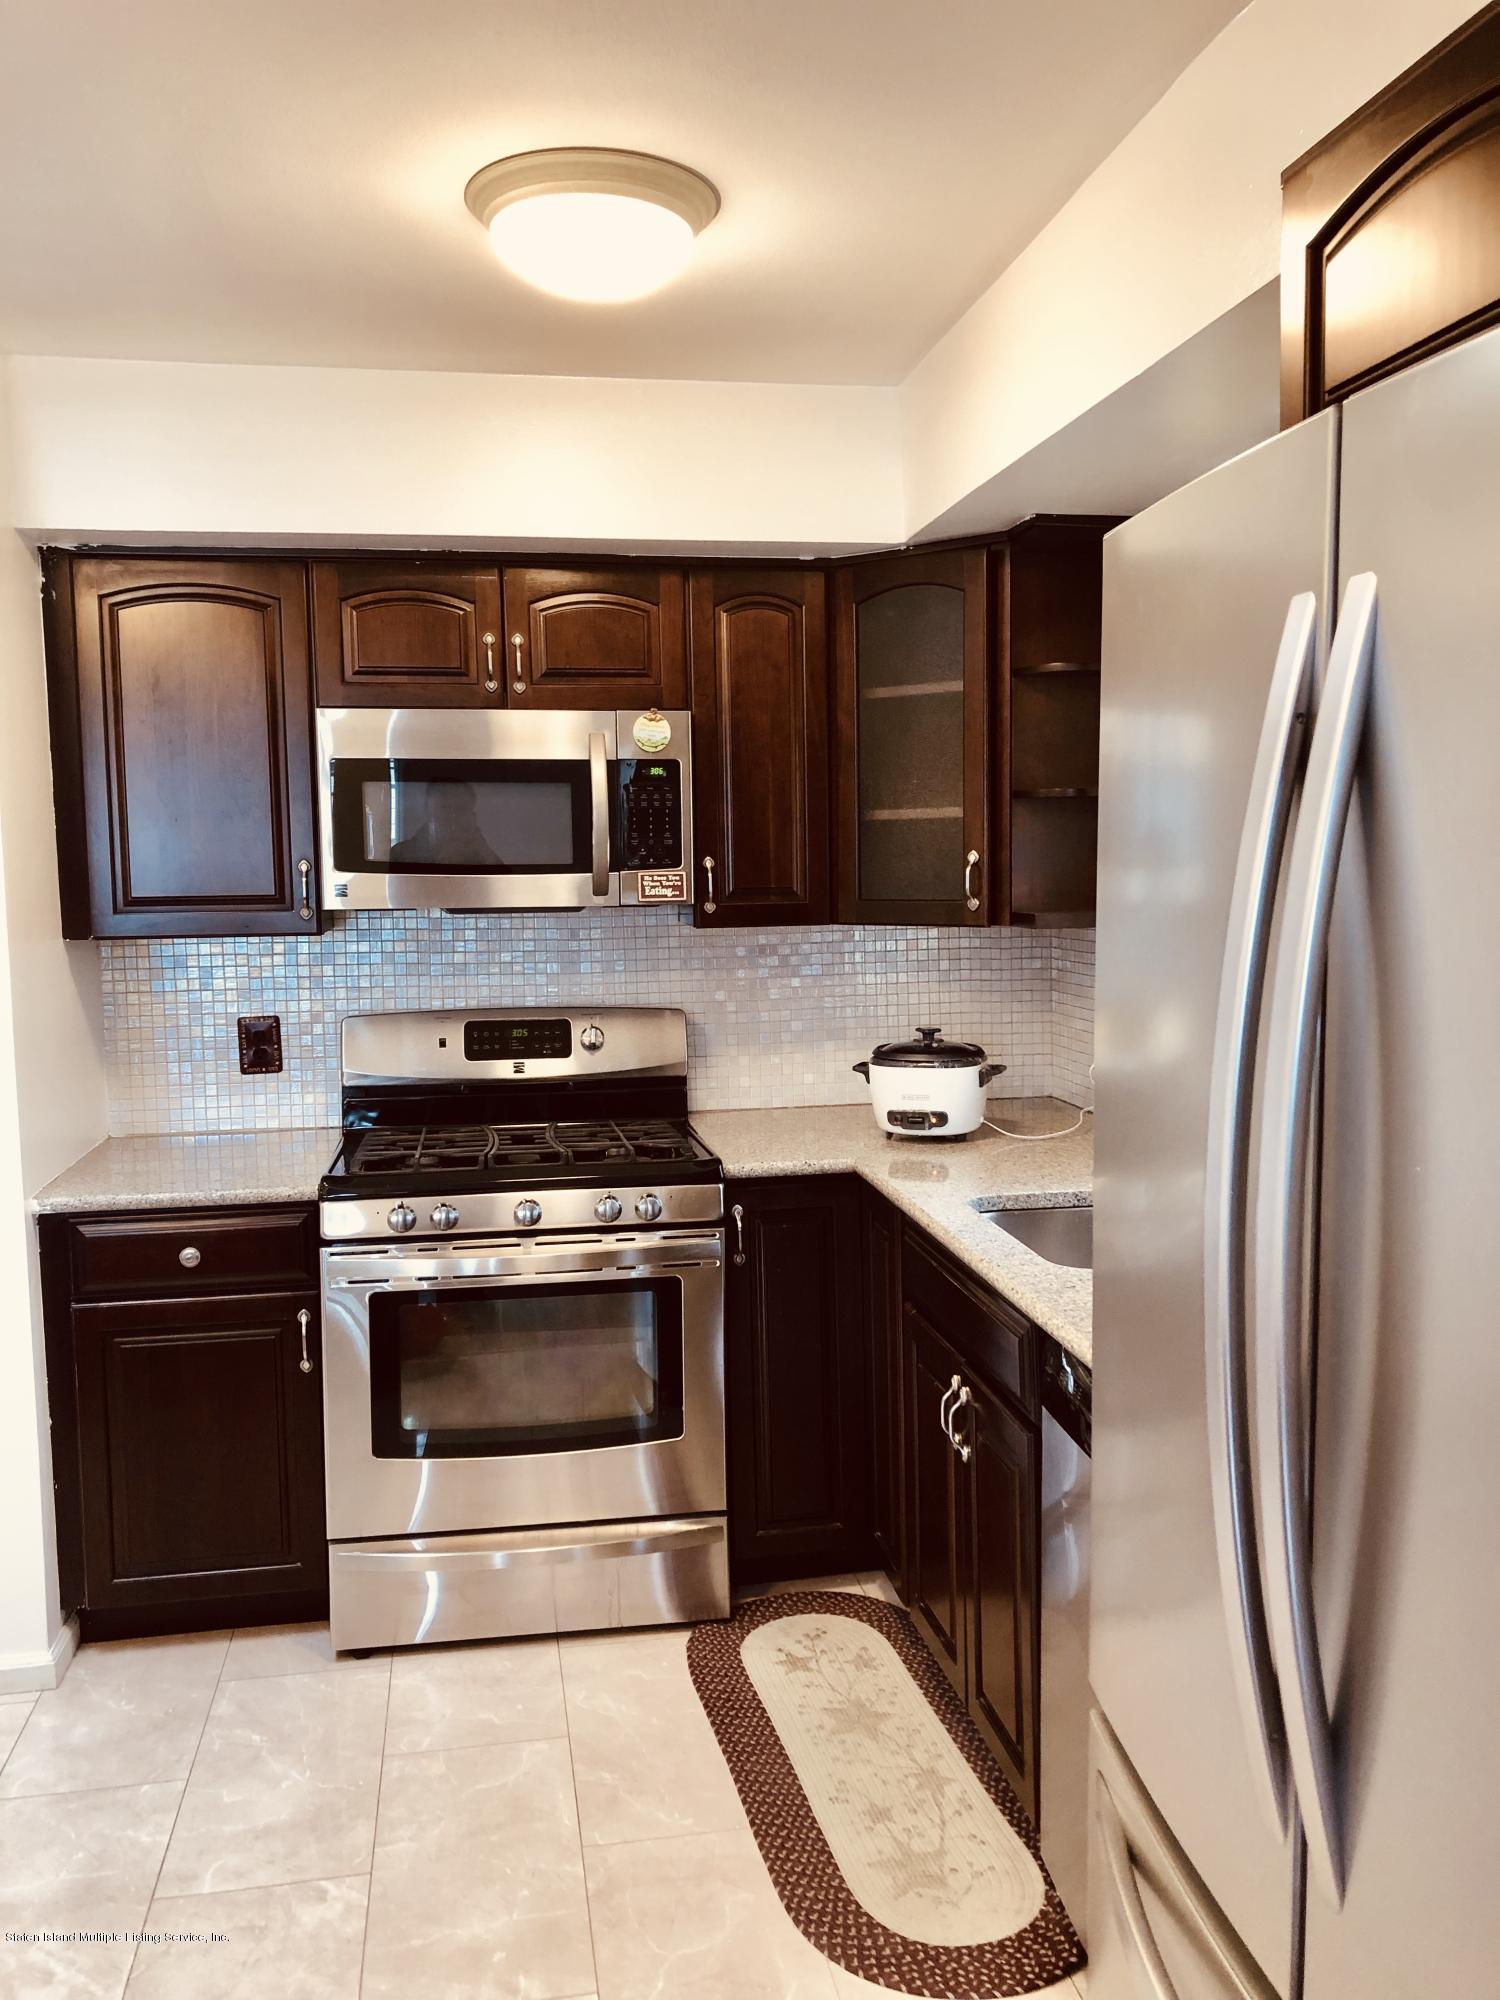 197 Spratt Avenue,Staten Island,New York,10306,United States,3 Bedrooms Bedrooms,6 Rooms Rooms,1 BathroomBathrooms,Res-Rental,Spratt,1127758